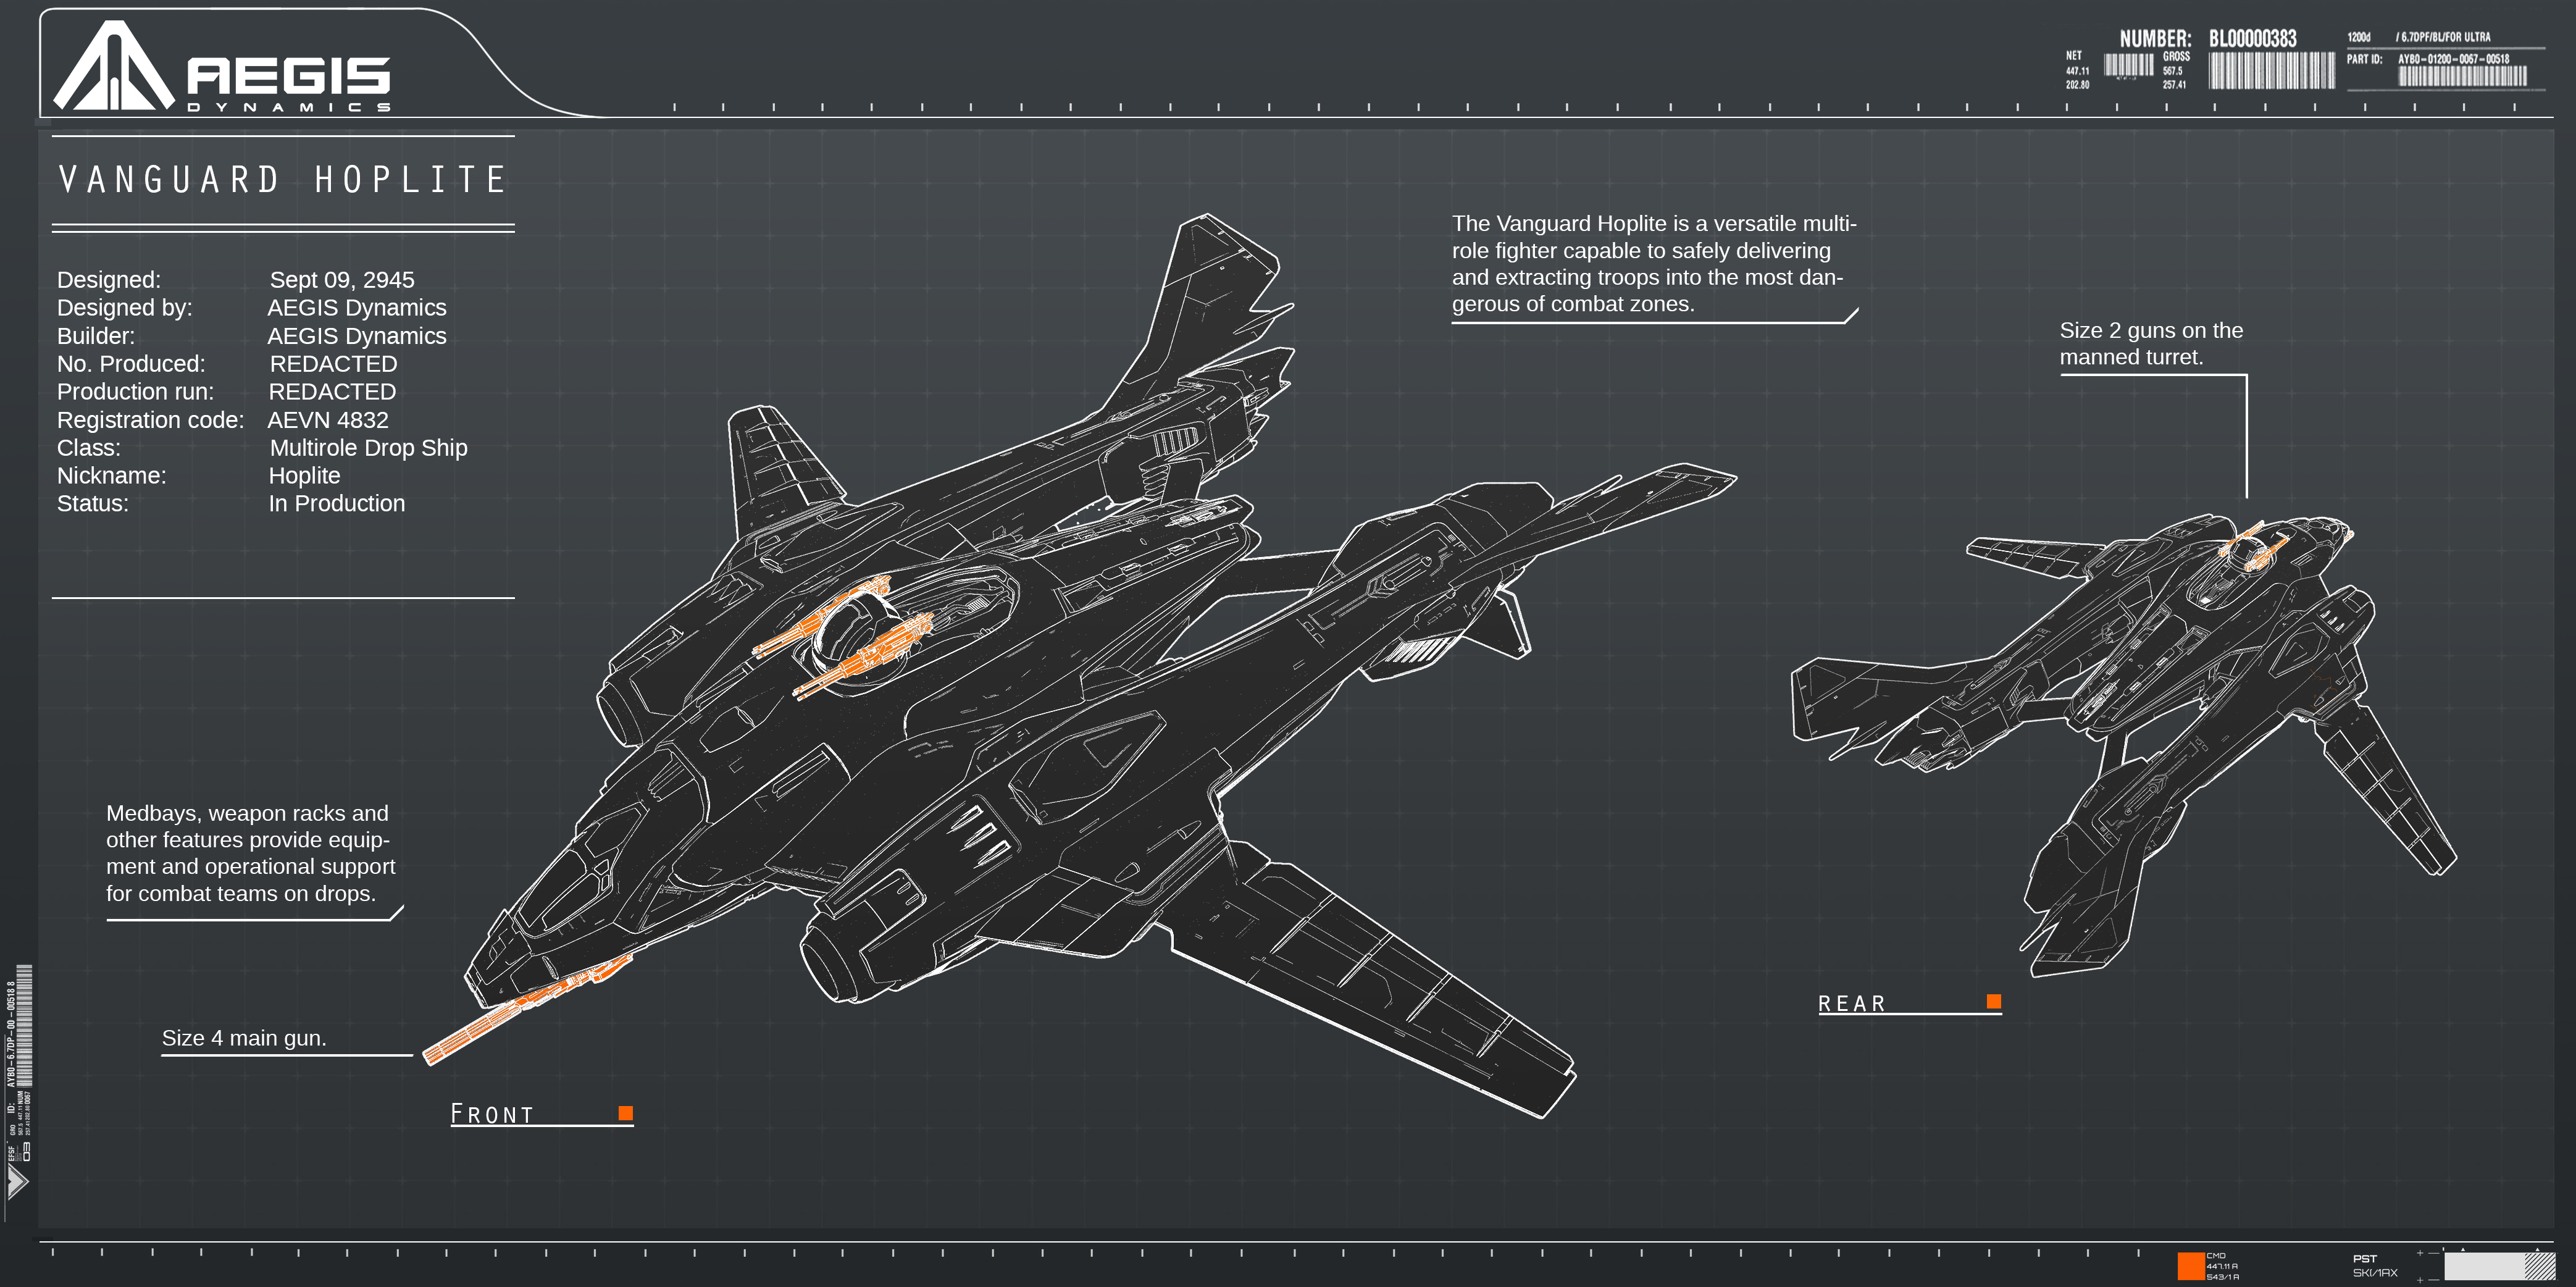 Aegis Dynamics Vanguard series Aegis-Vanguard-Hoplite-V2-P2